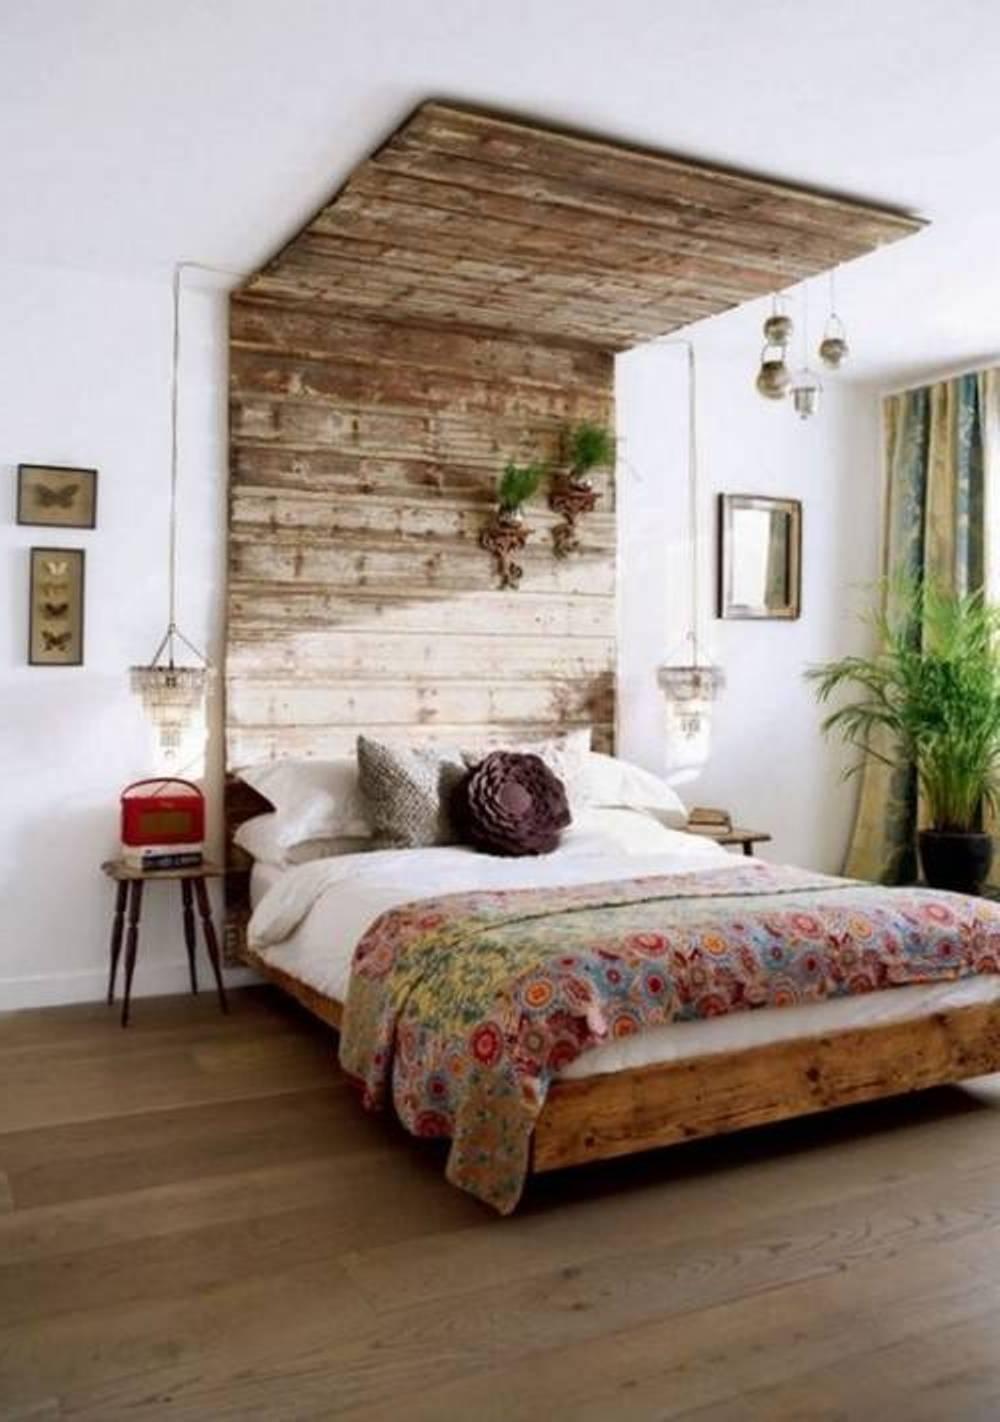 Rustic Modern Boy Room - Taryn Whiteaker